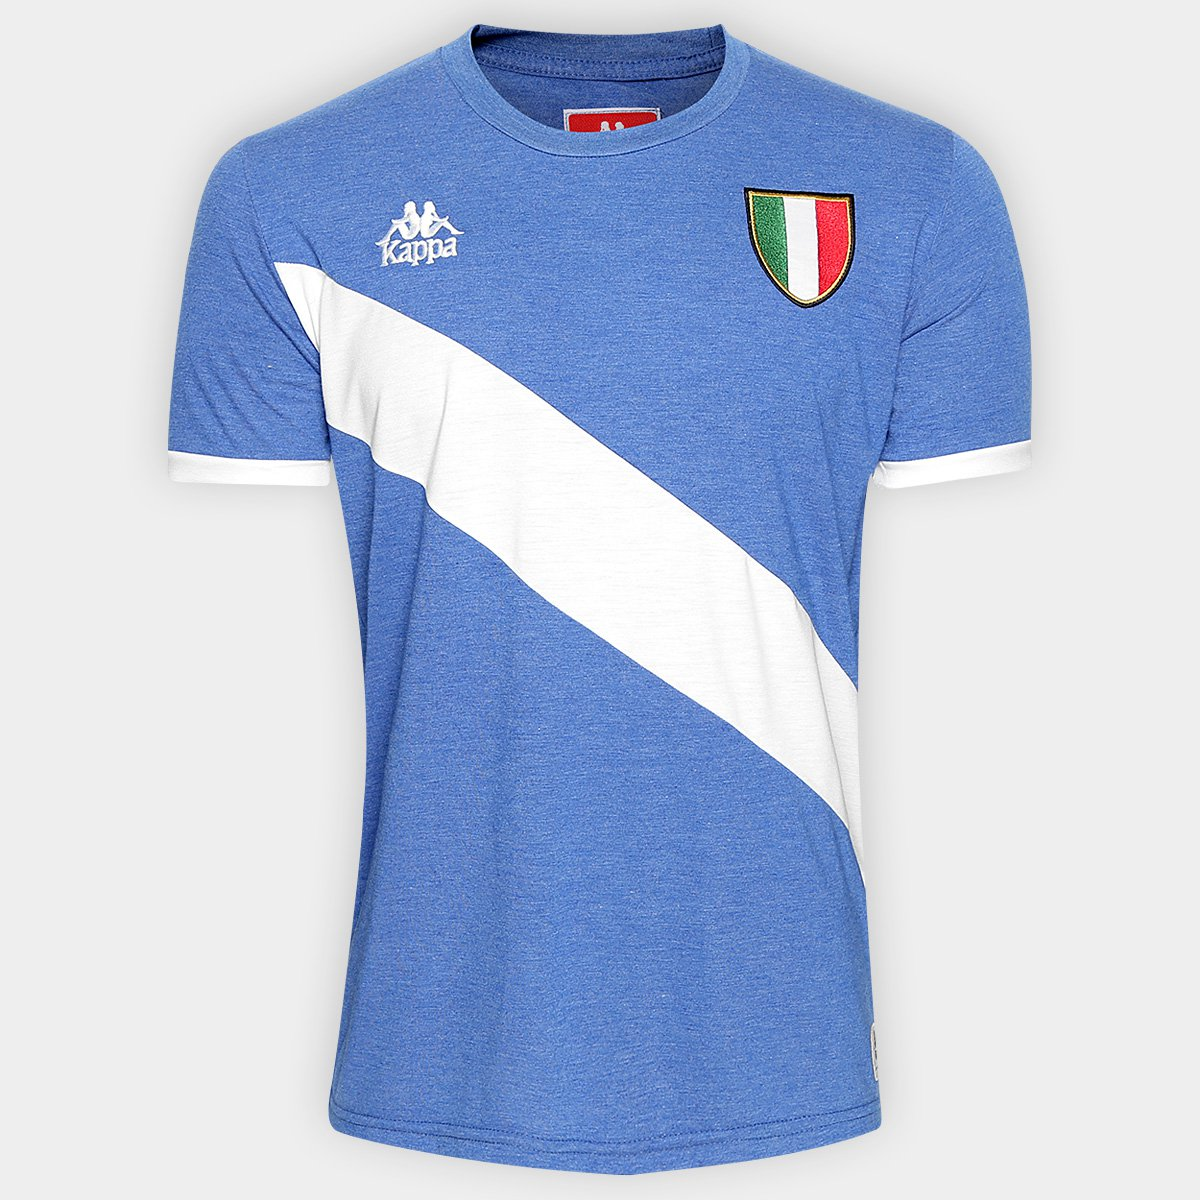 Camiseta Itália Kappa Masculina - Compre Agora  4130c3df87393